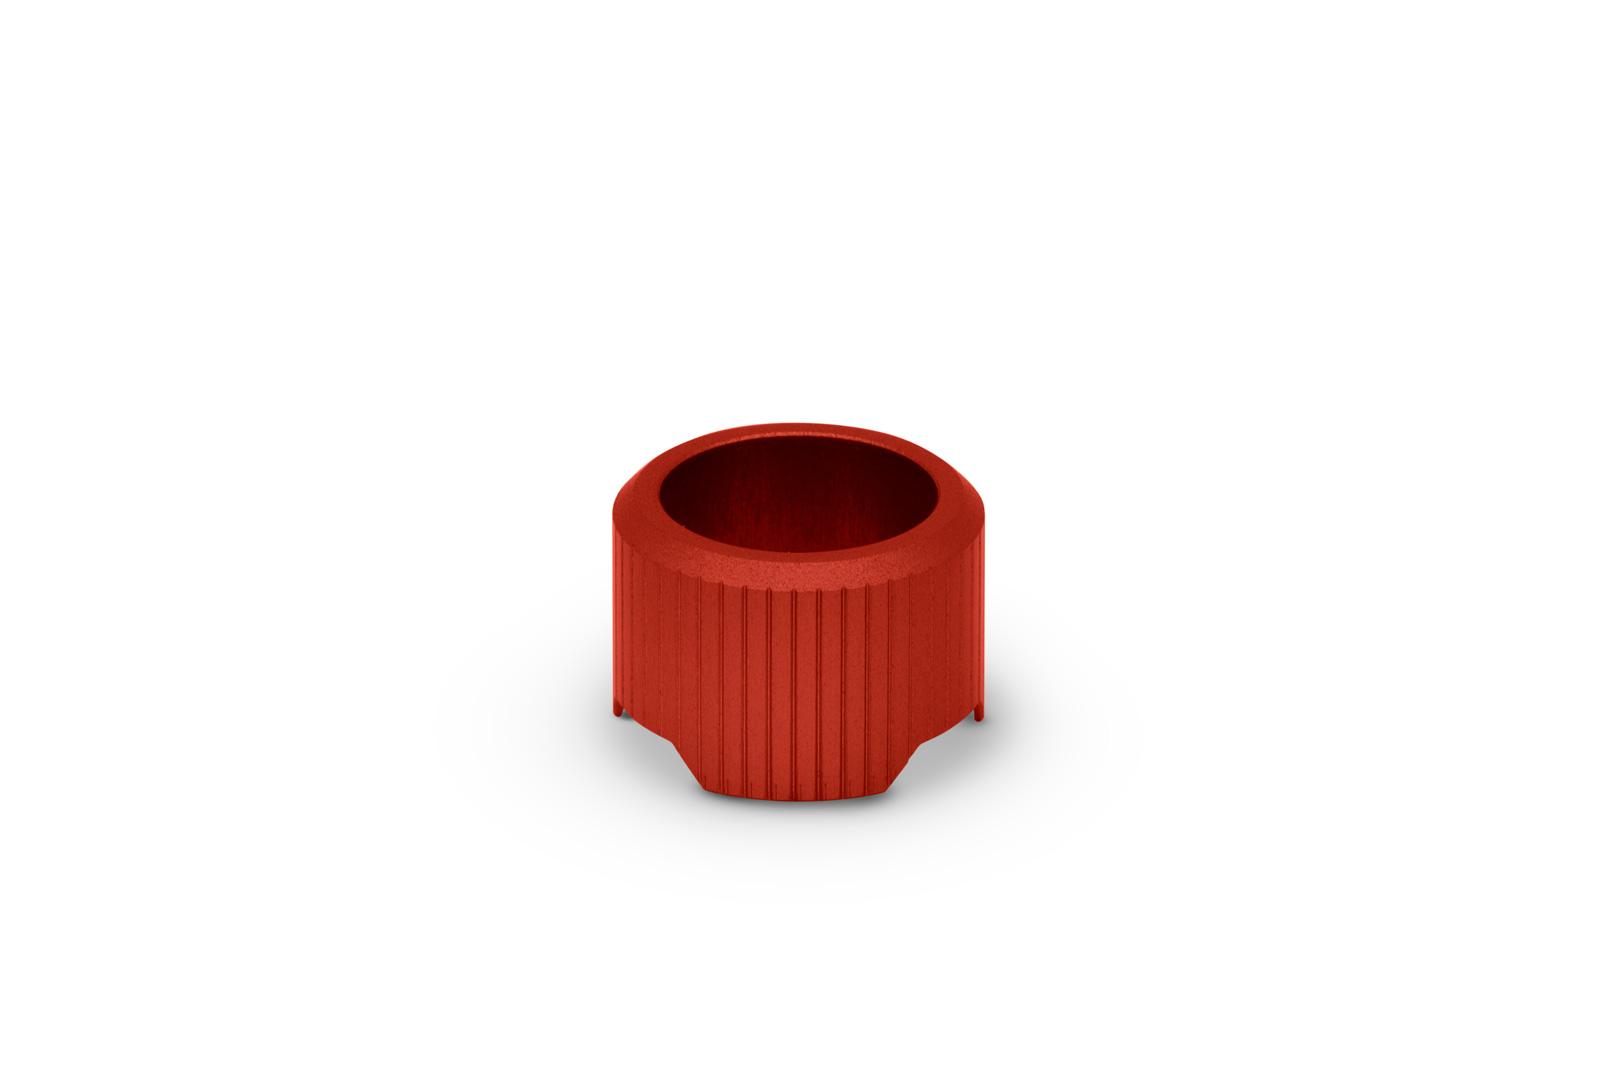 EK-Quantum_Torque_Compression_Ring_6-Pack_STC_16-Red_TOP